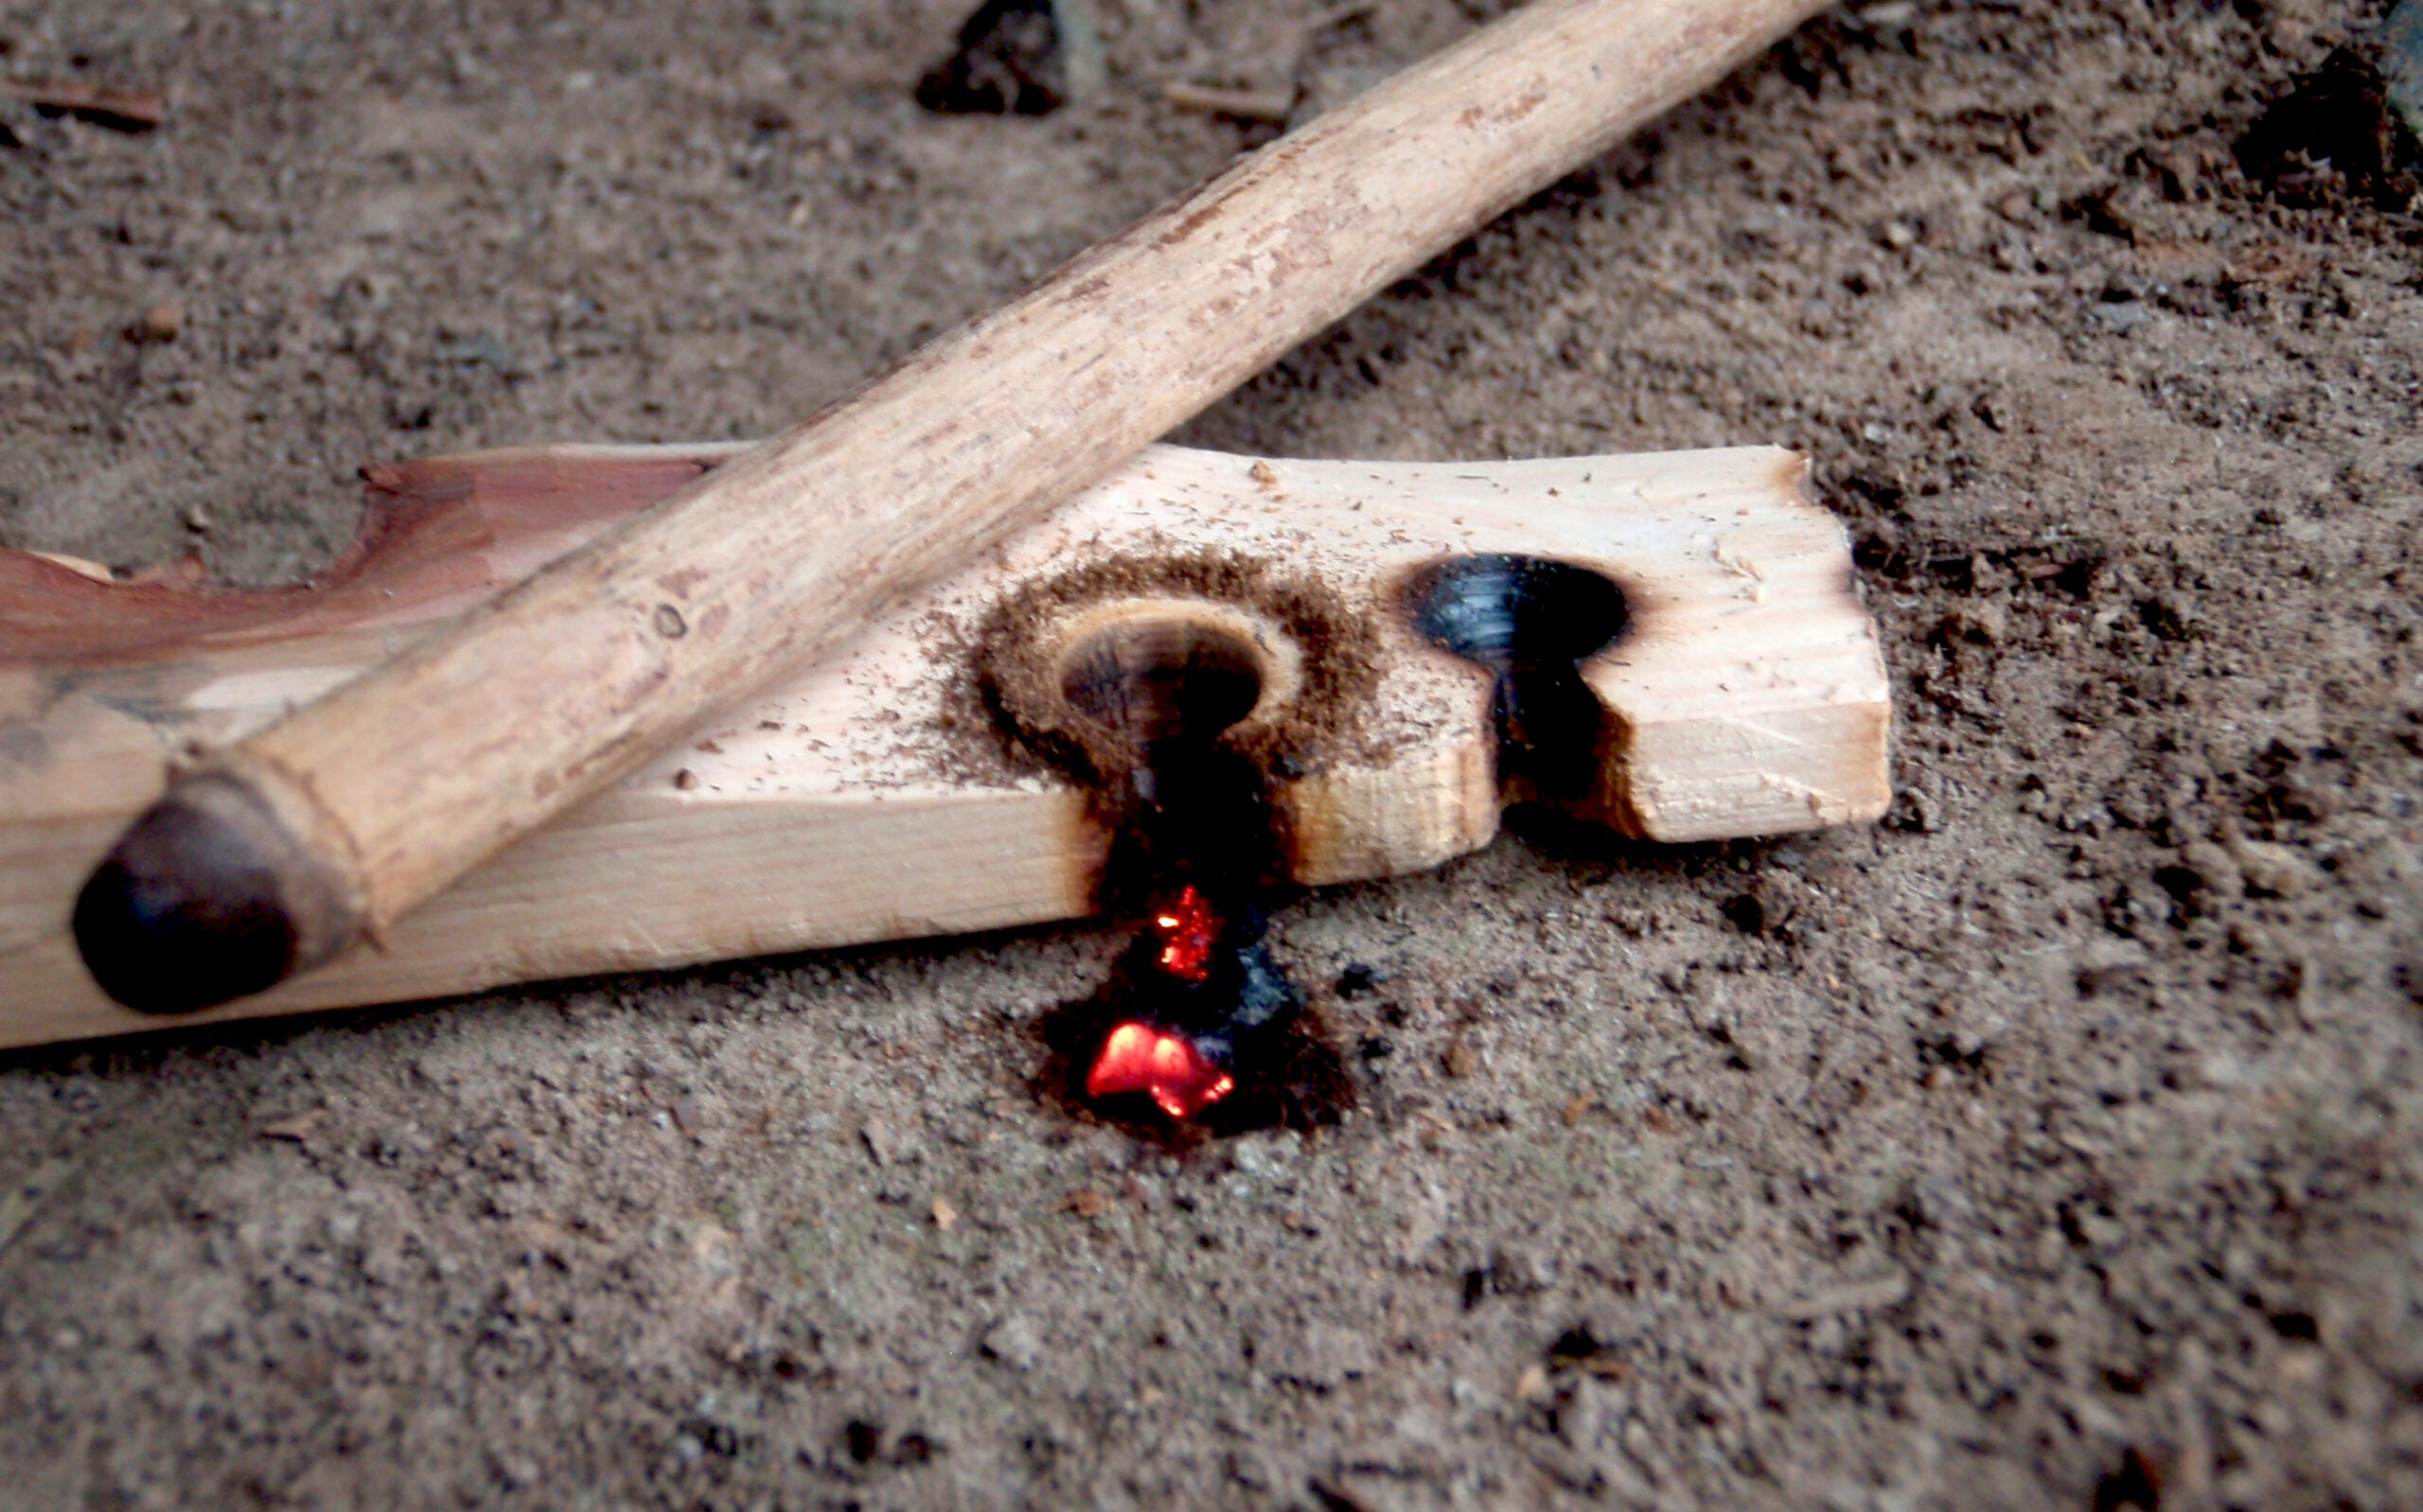 Survival Skills: Hand Drill Fire Making